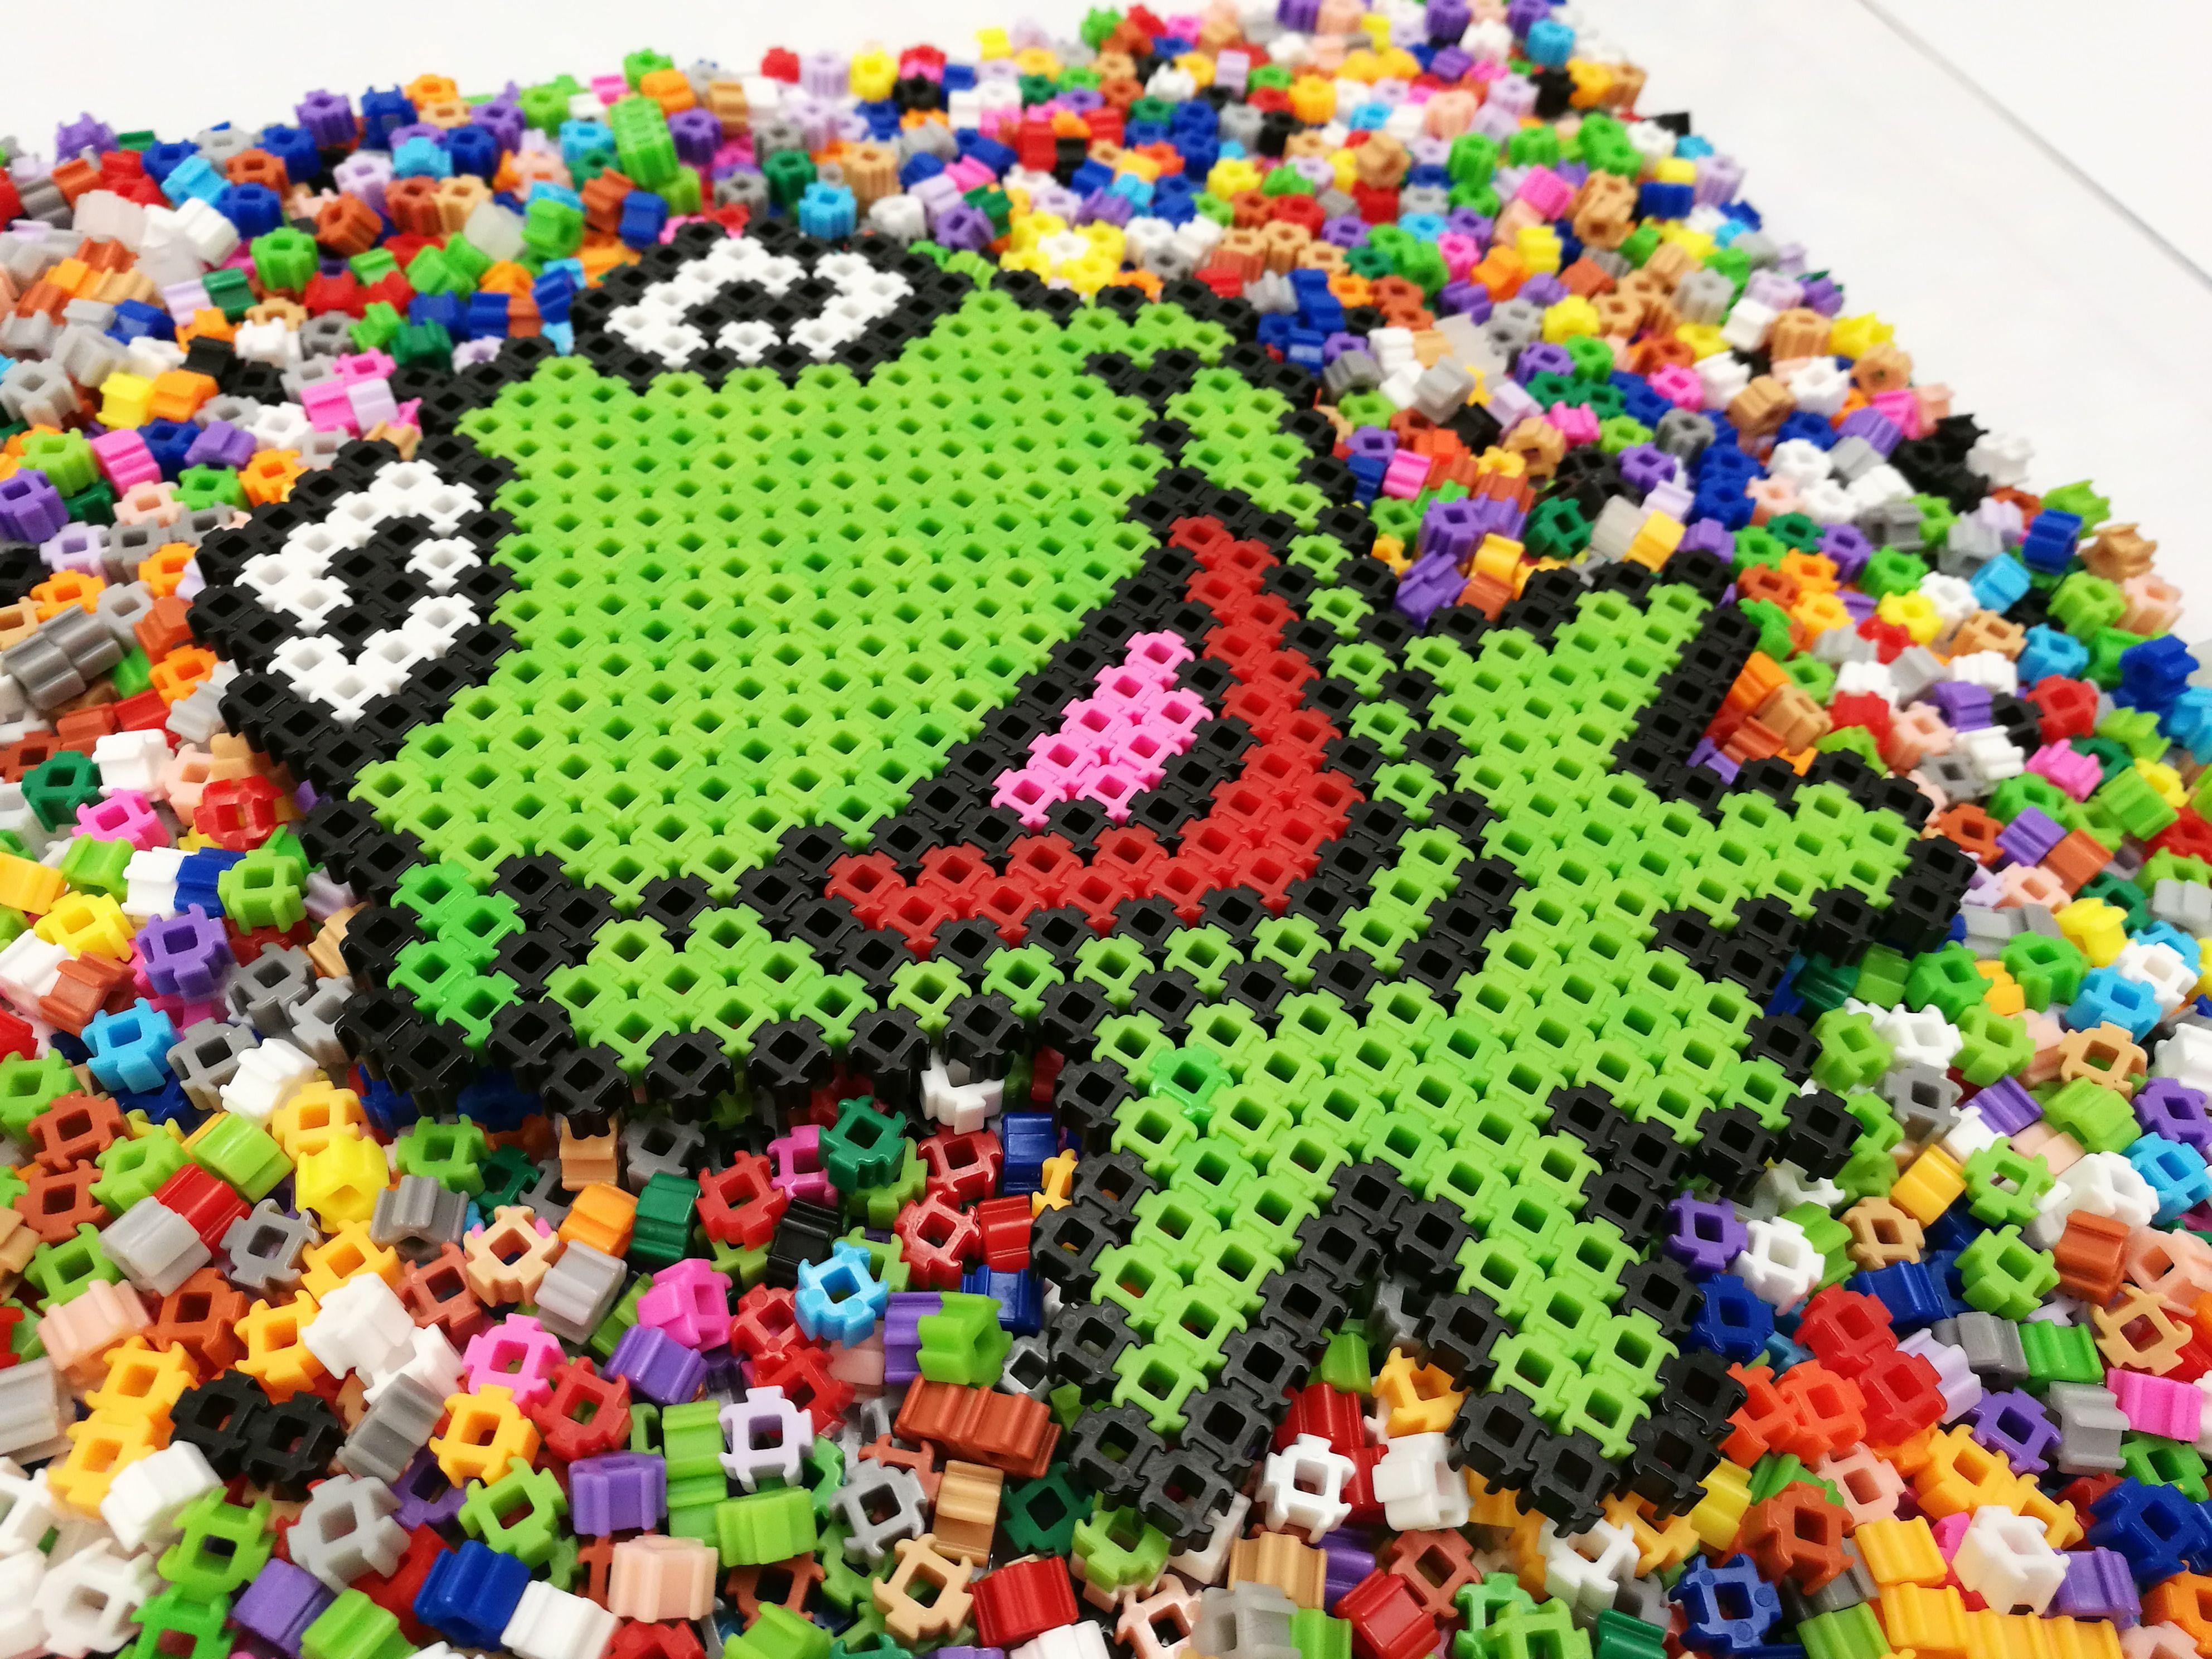 Kermit The Frog Simbrix Beads Puzzle Lego Art Artstagram